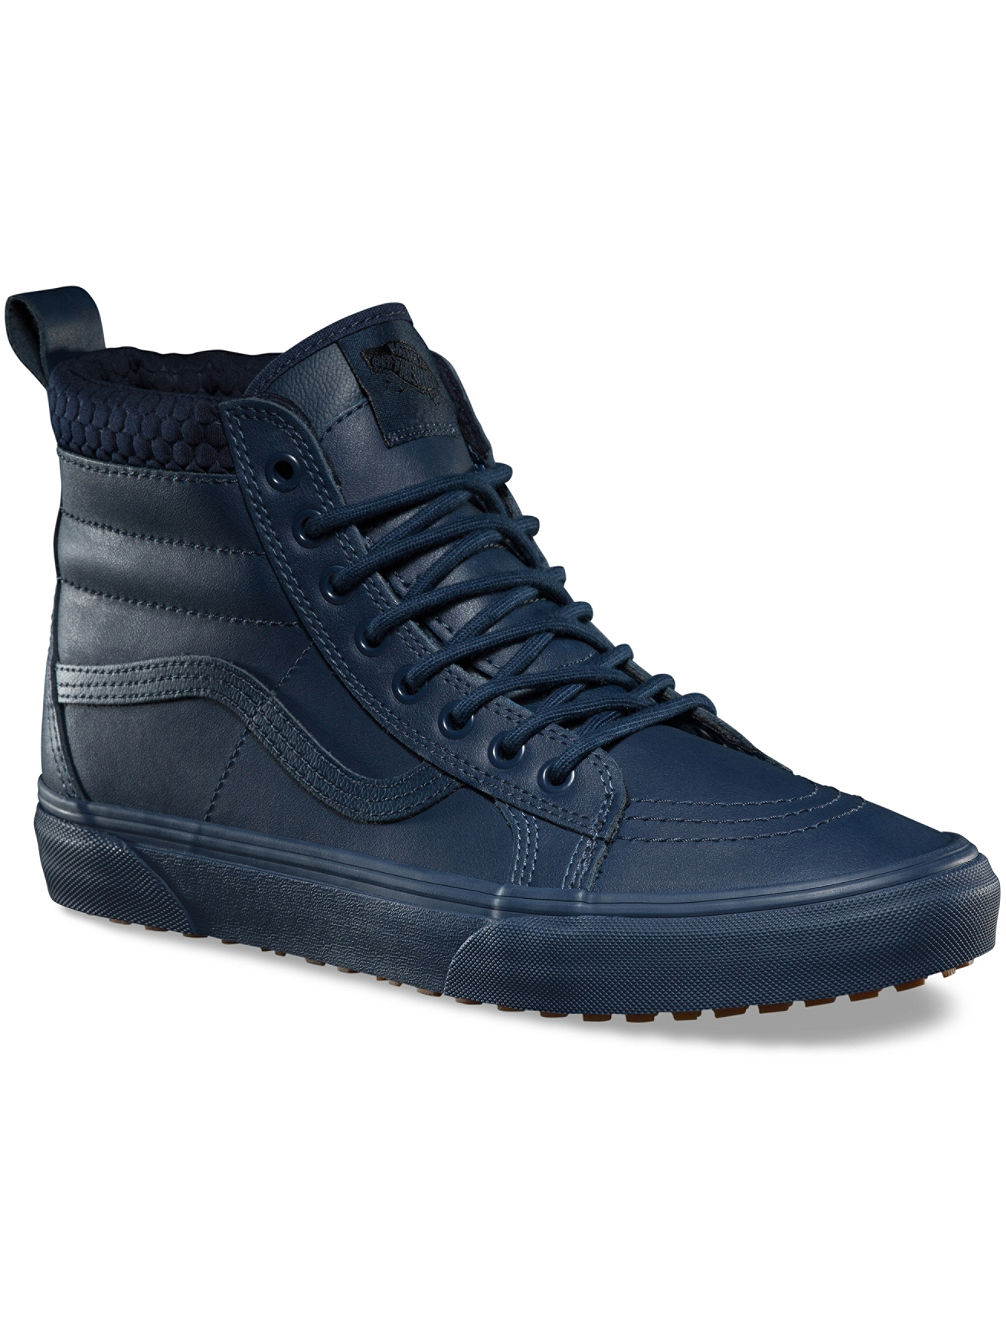 fab8bbee5e0 Buy Vans Sk8-Hi Mte Shoes online at blue-tomato.com